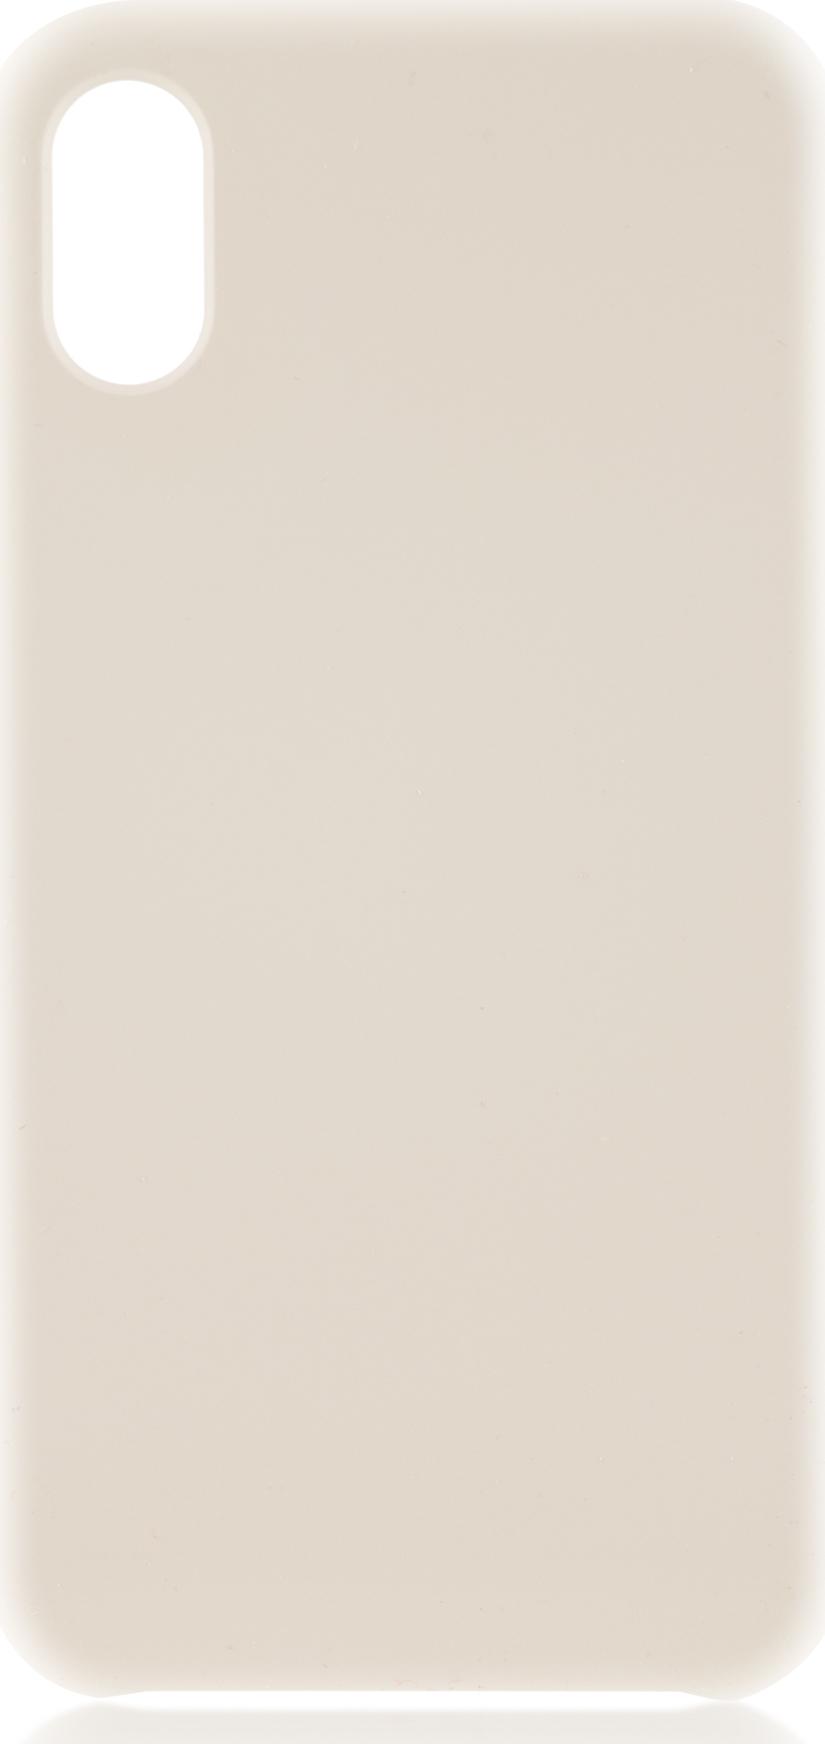 Чехол Brosco Softrubber для Apple iPhone X, белый аксессуар чехол для apple iphone 6 brosco soft rubber black ip6 softrubber black